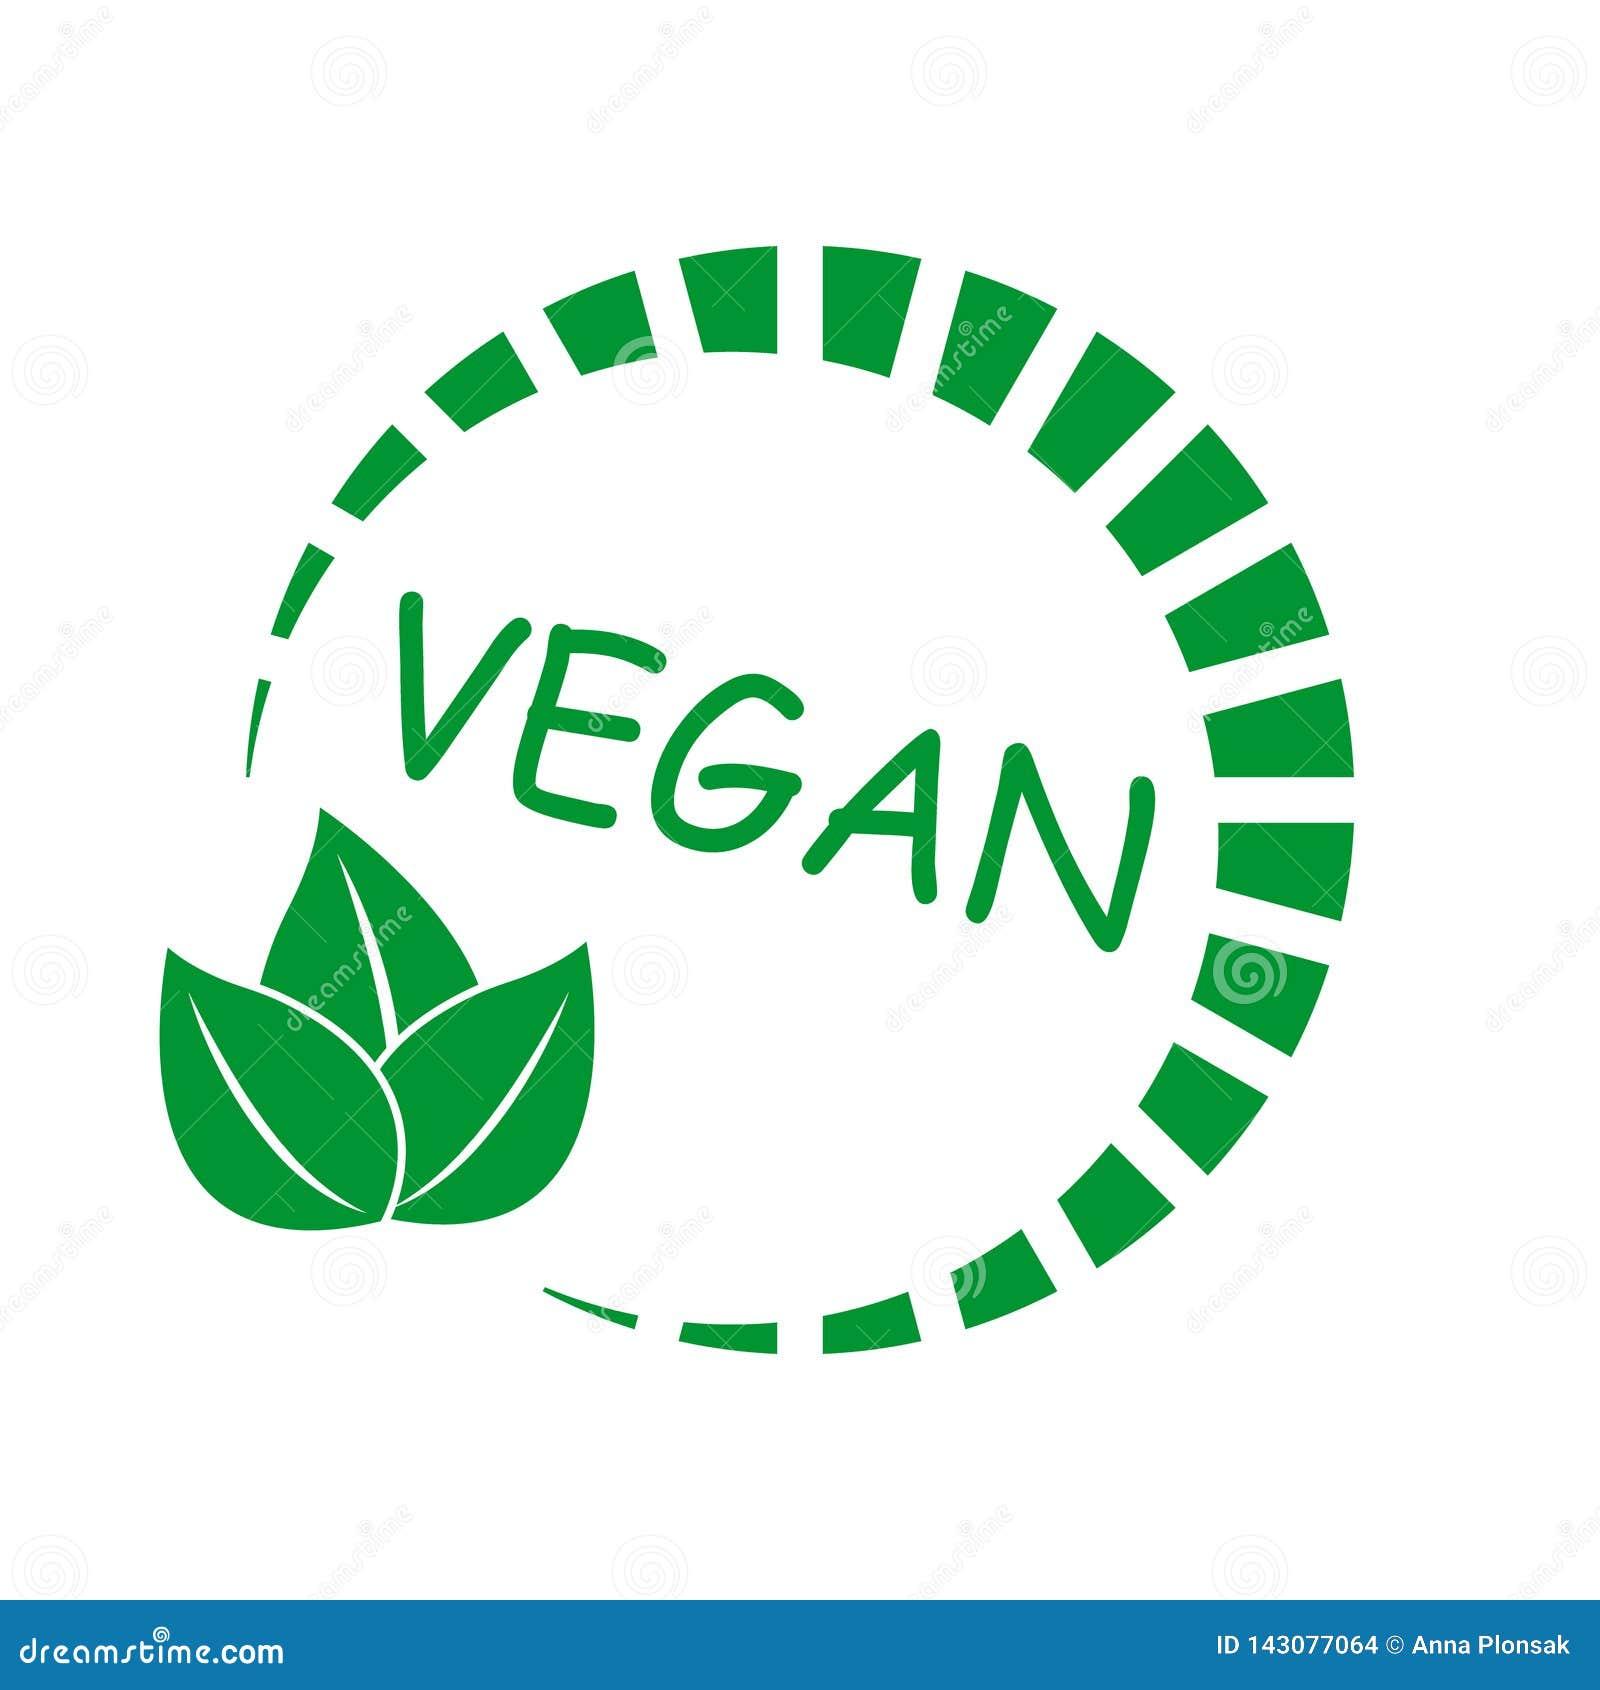 Vegan Icon  Natural Product  Symbol Of Vegetarian Food  Organic